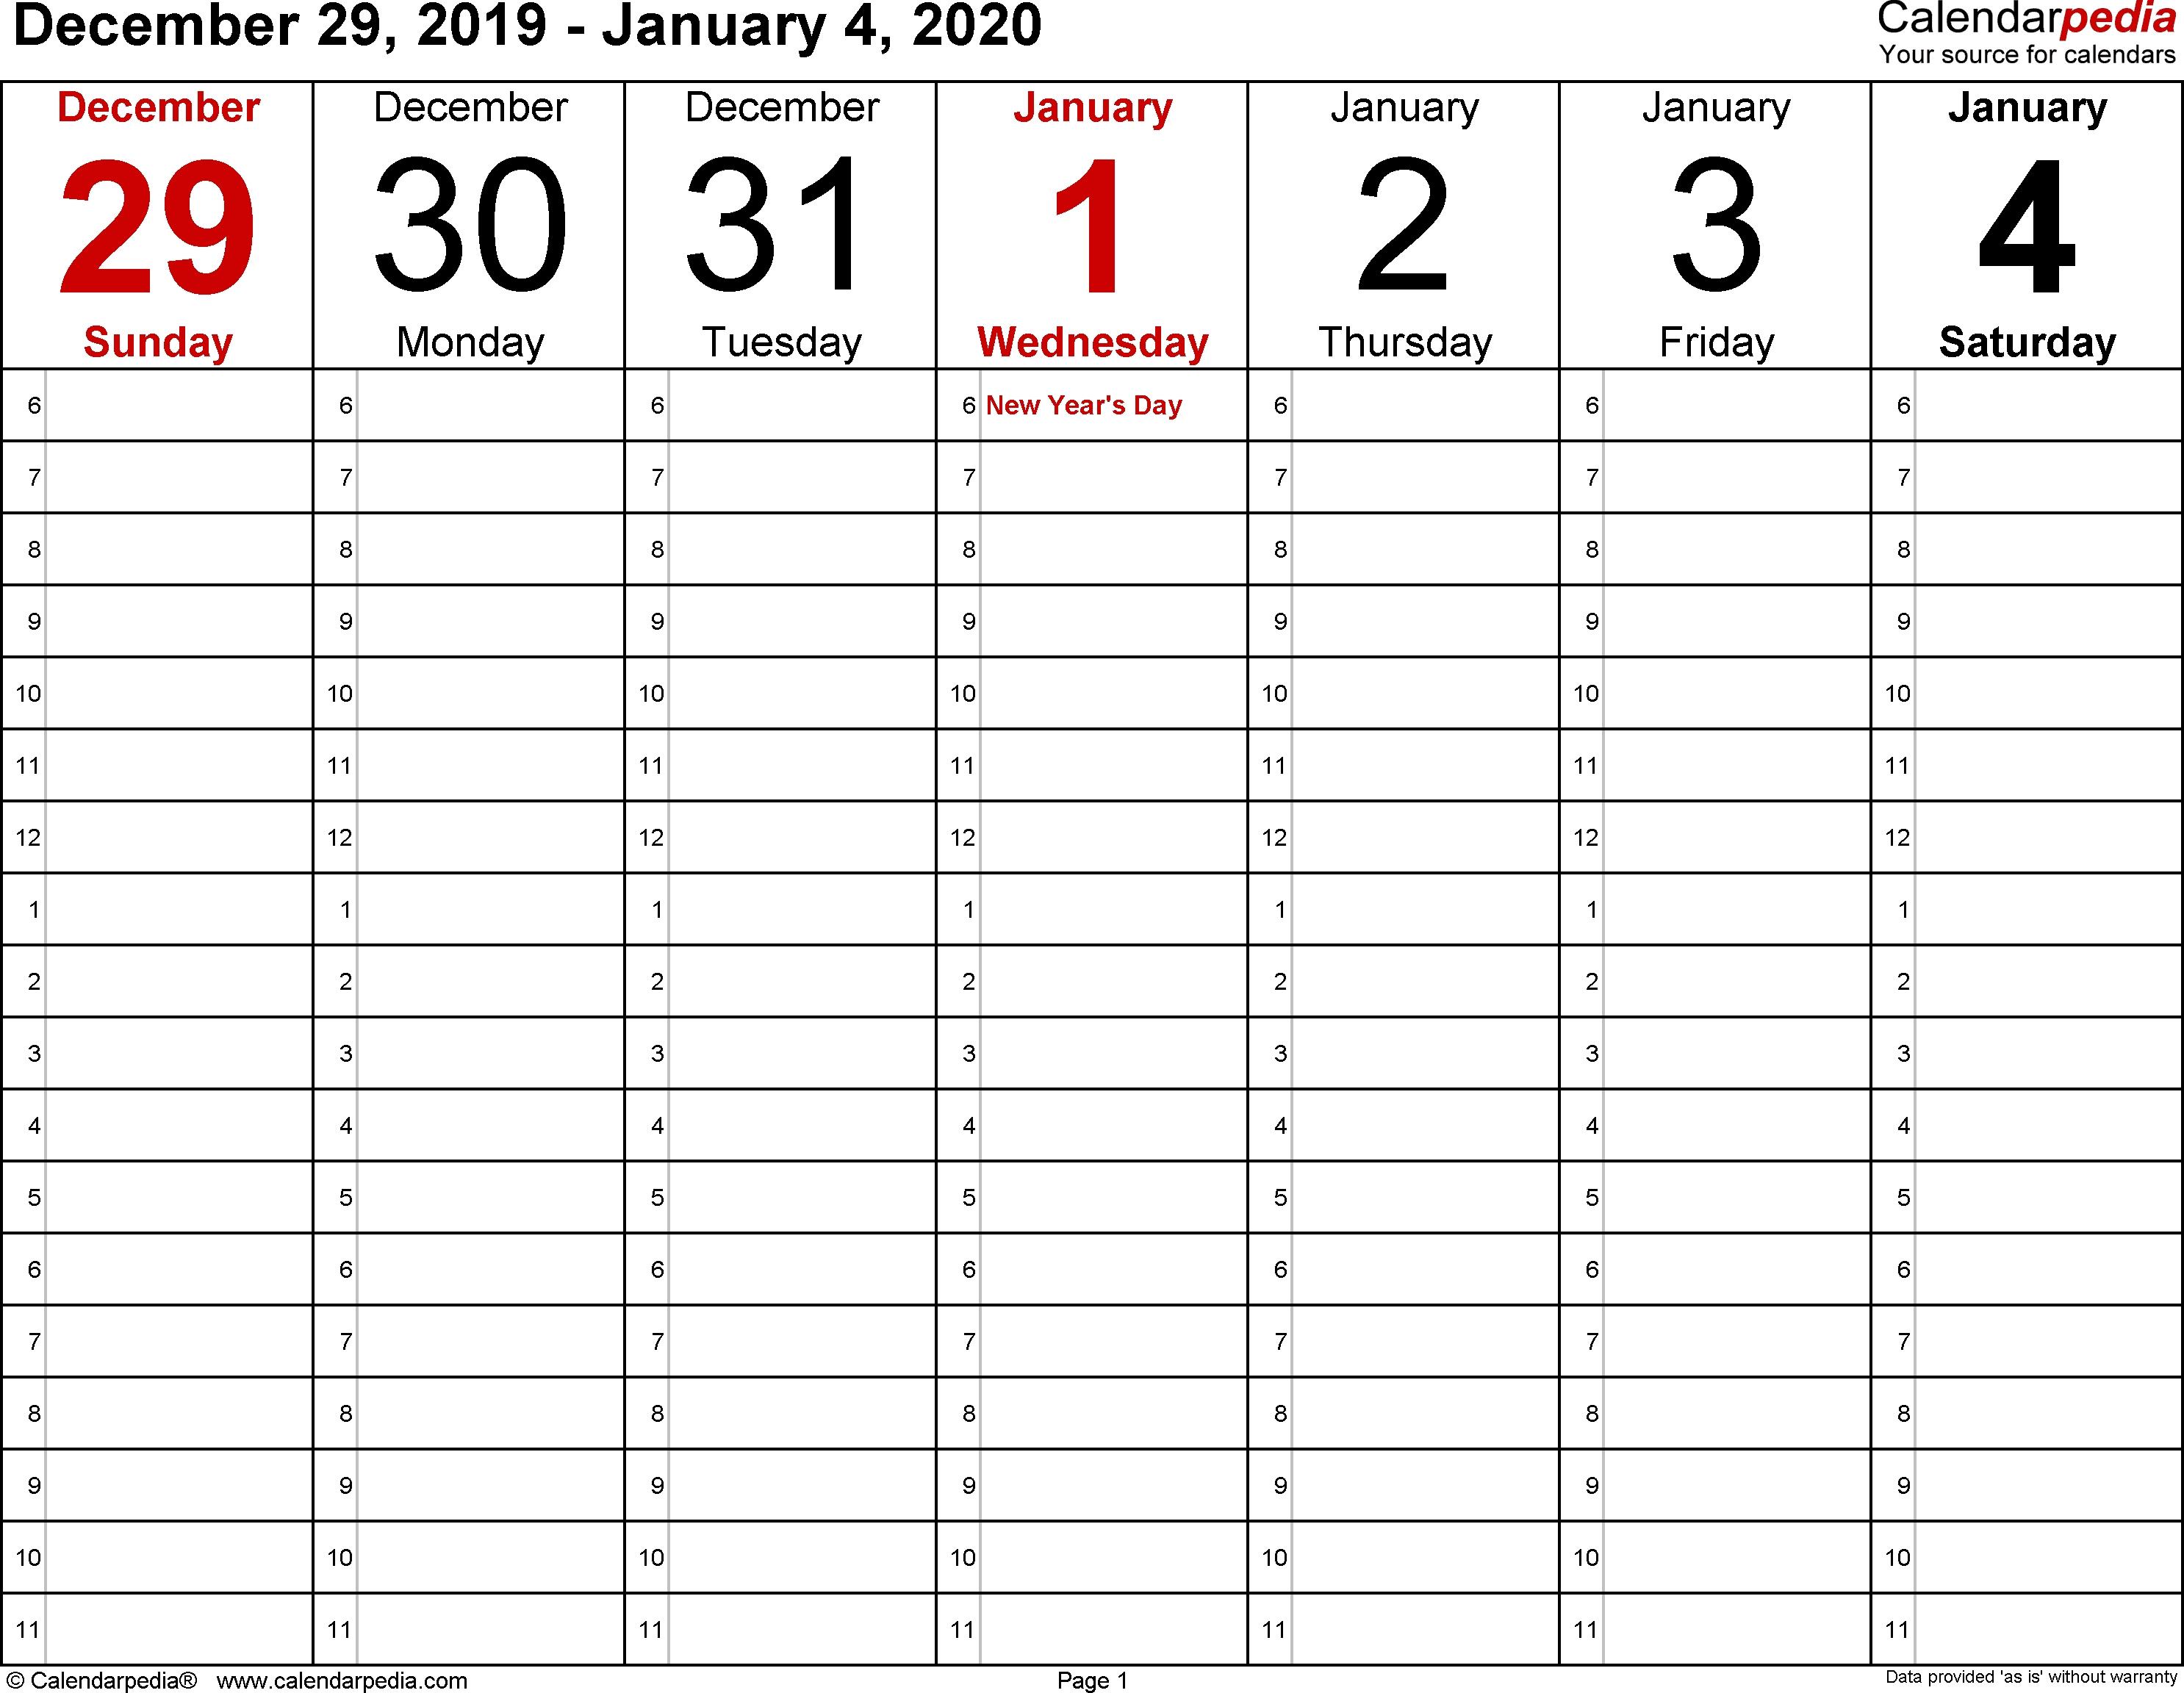 January 2020 Weekly Calendar | Monthly Calendar Template